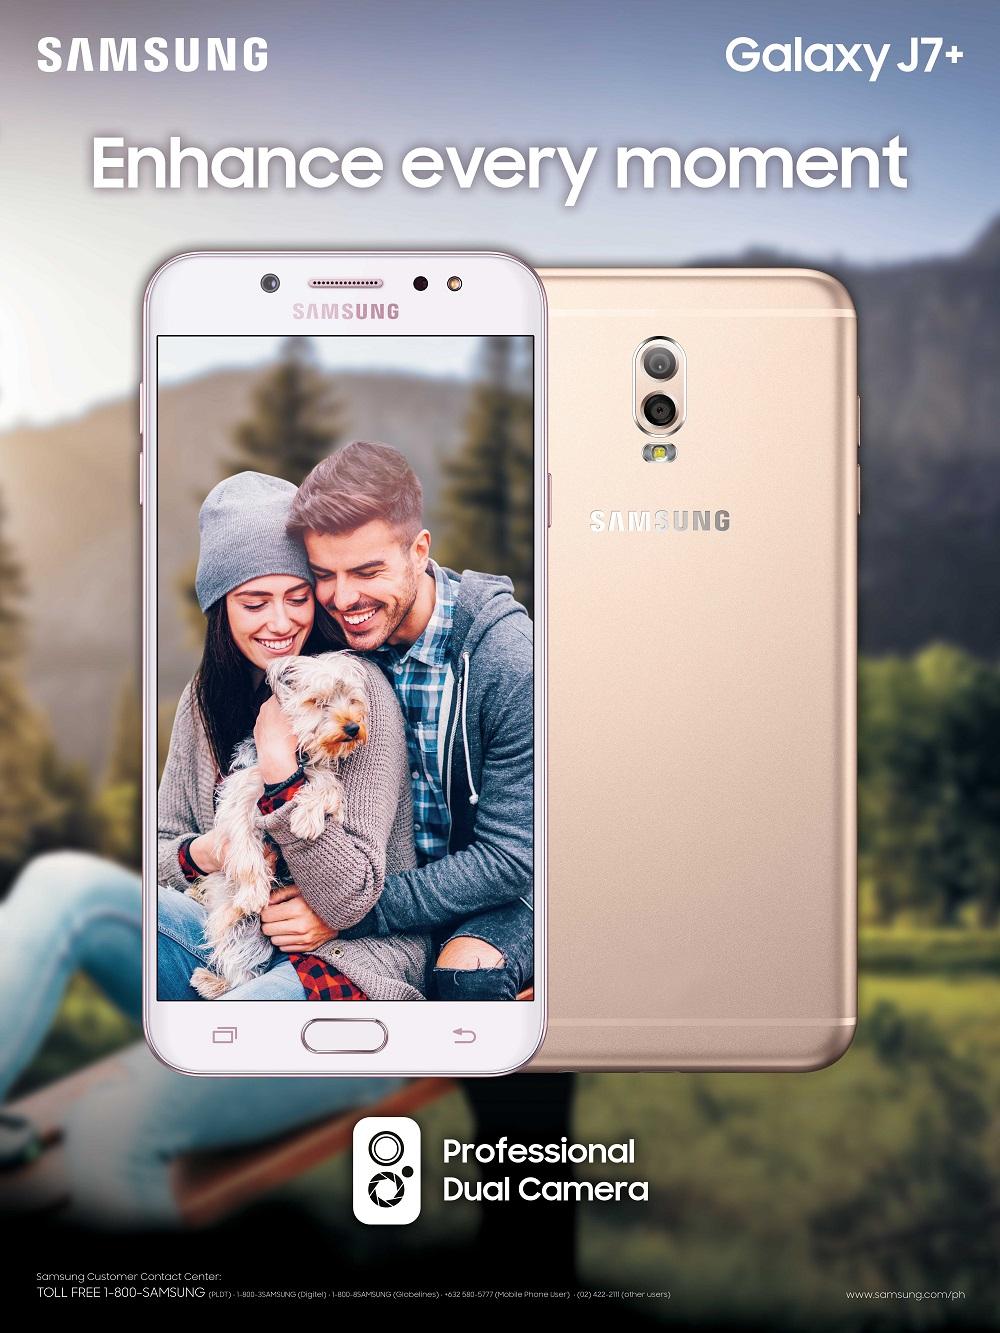 Samsung Galaxy J7+ at 0% interest